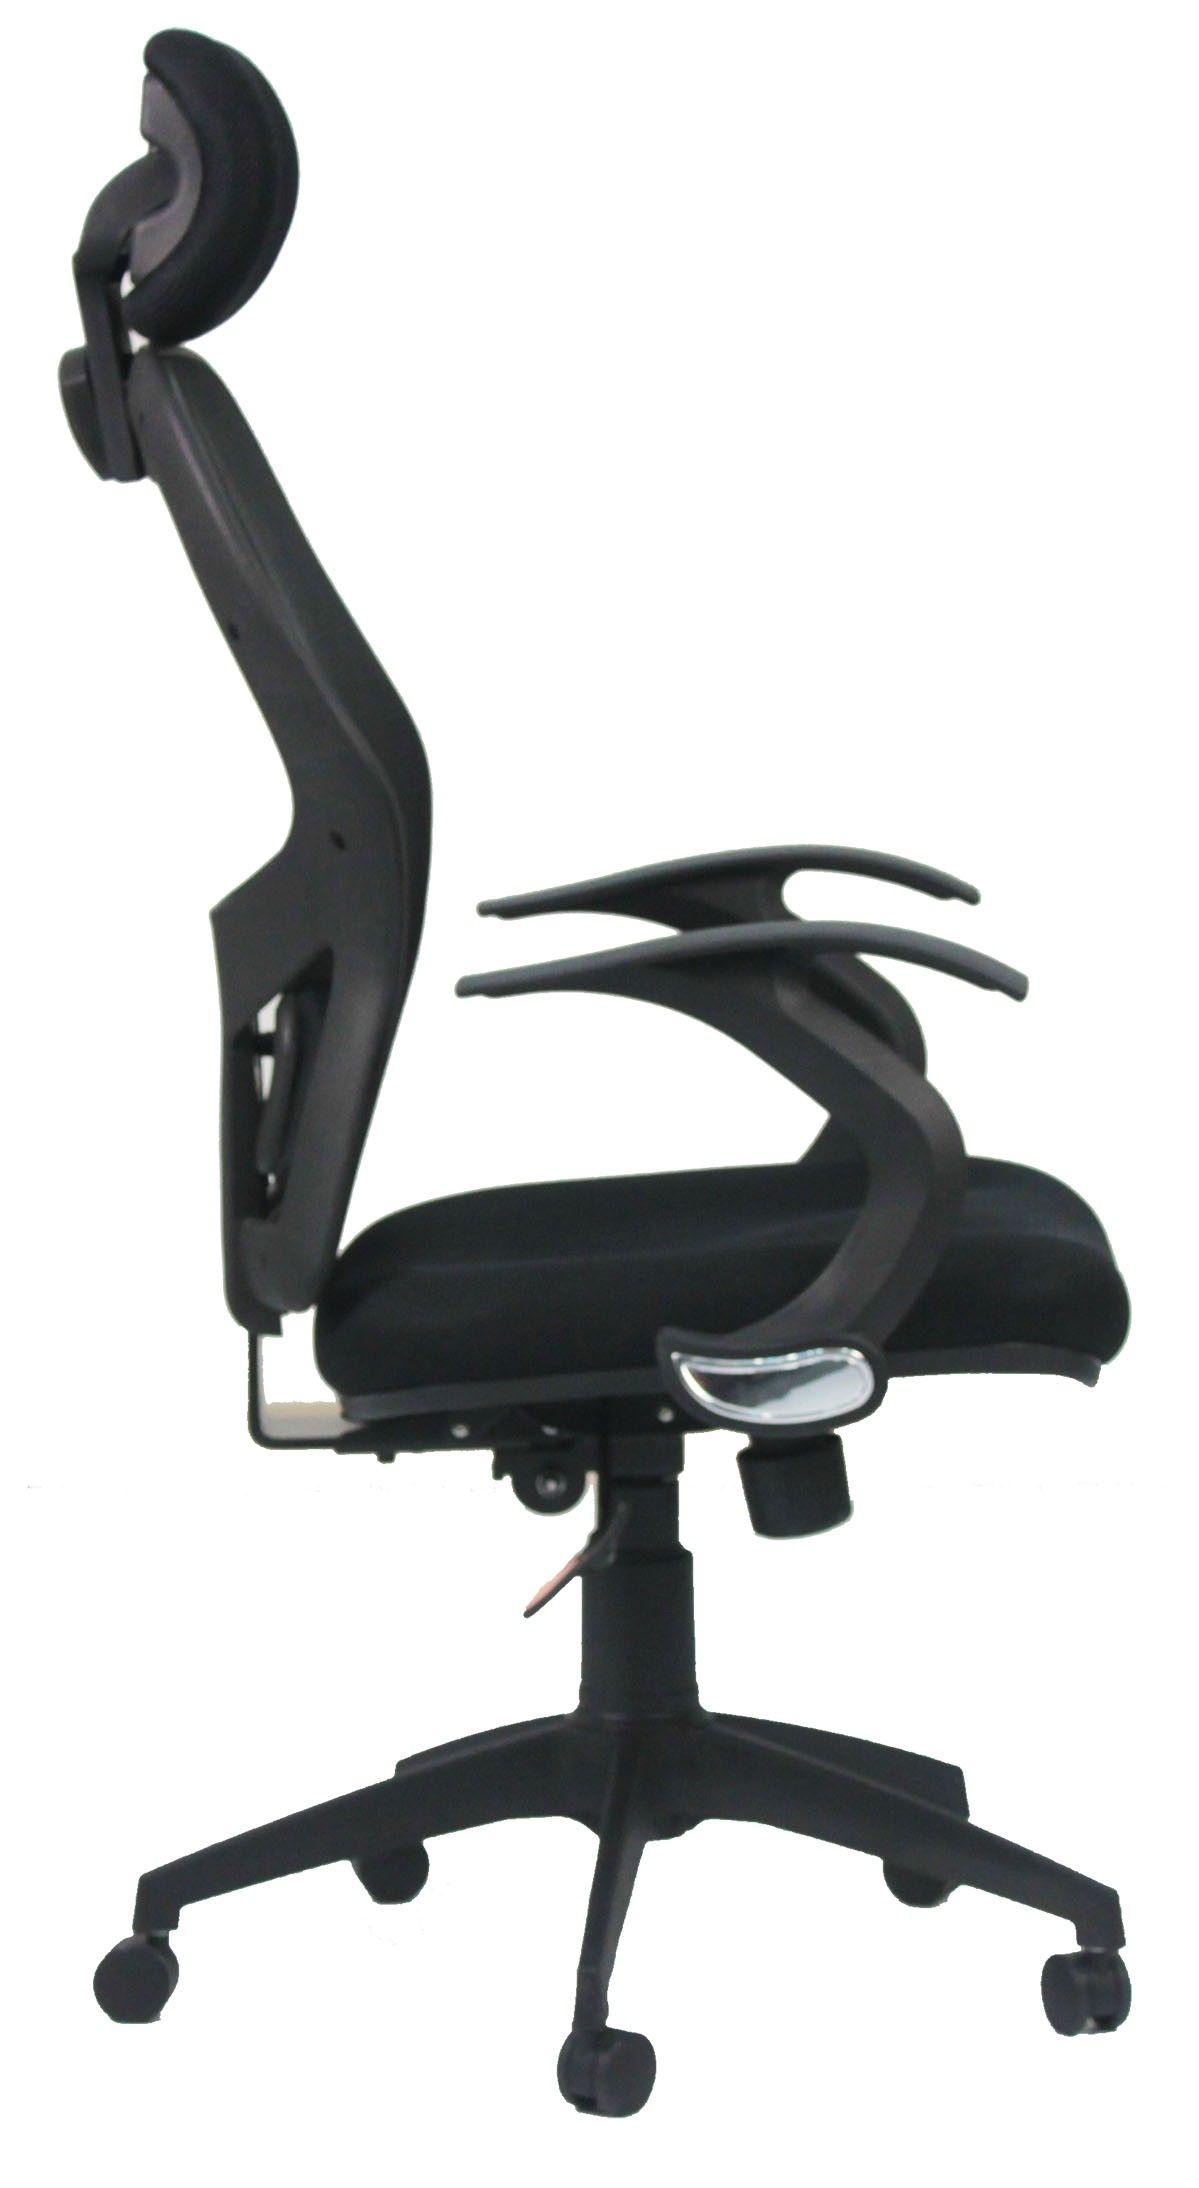 Aiko office chair